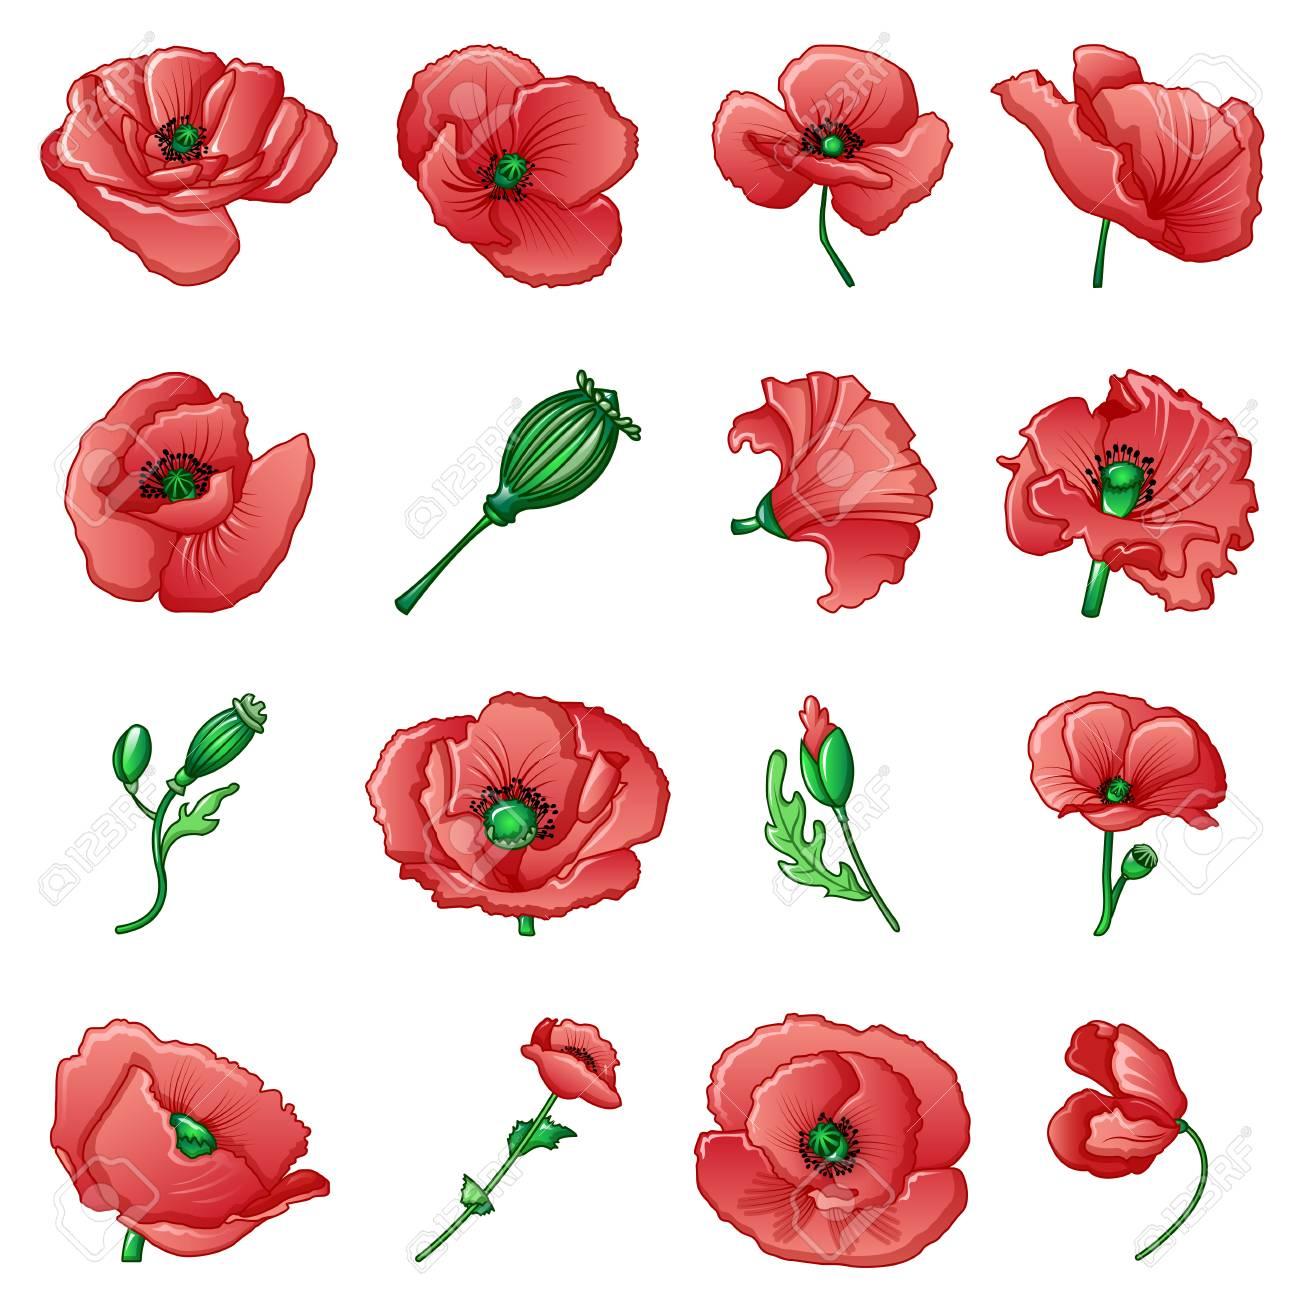 Poppy Flower Remembrance Day Icons Set Cartoon Illustration